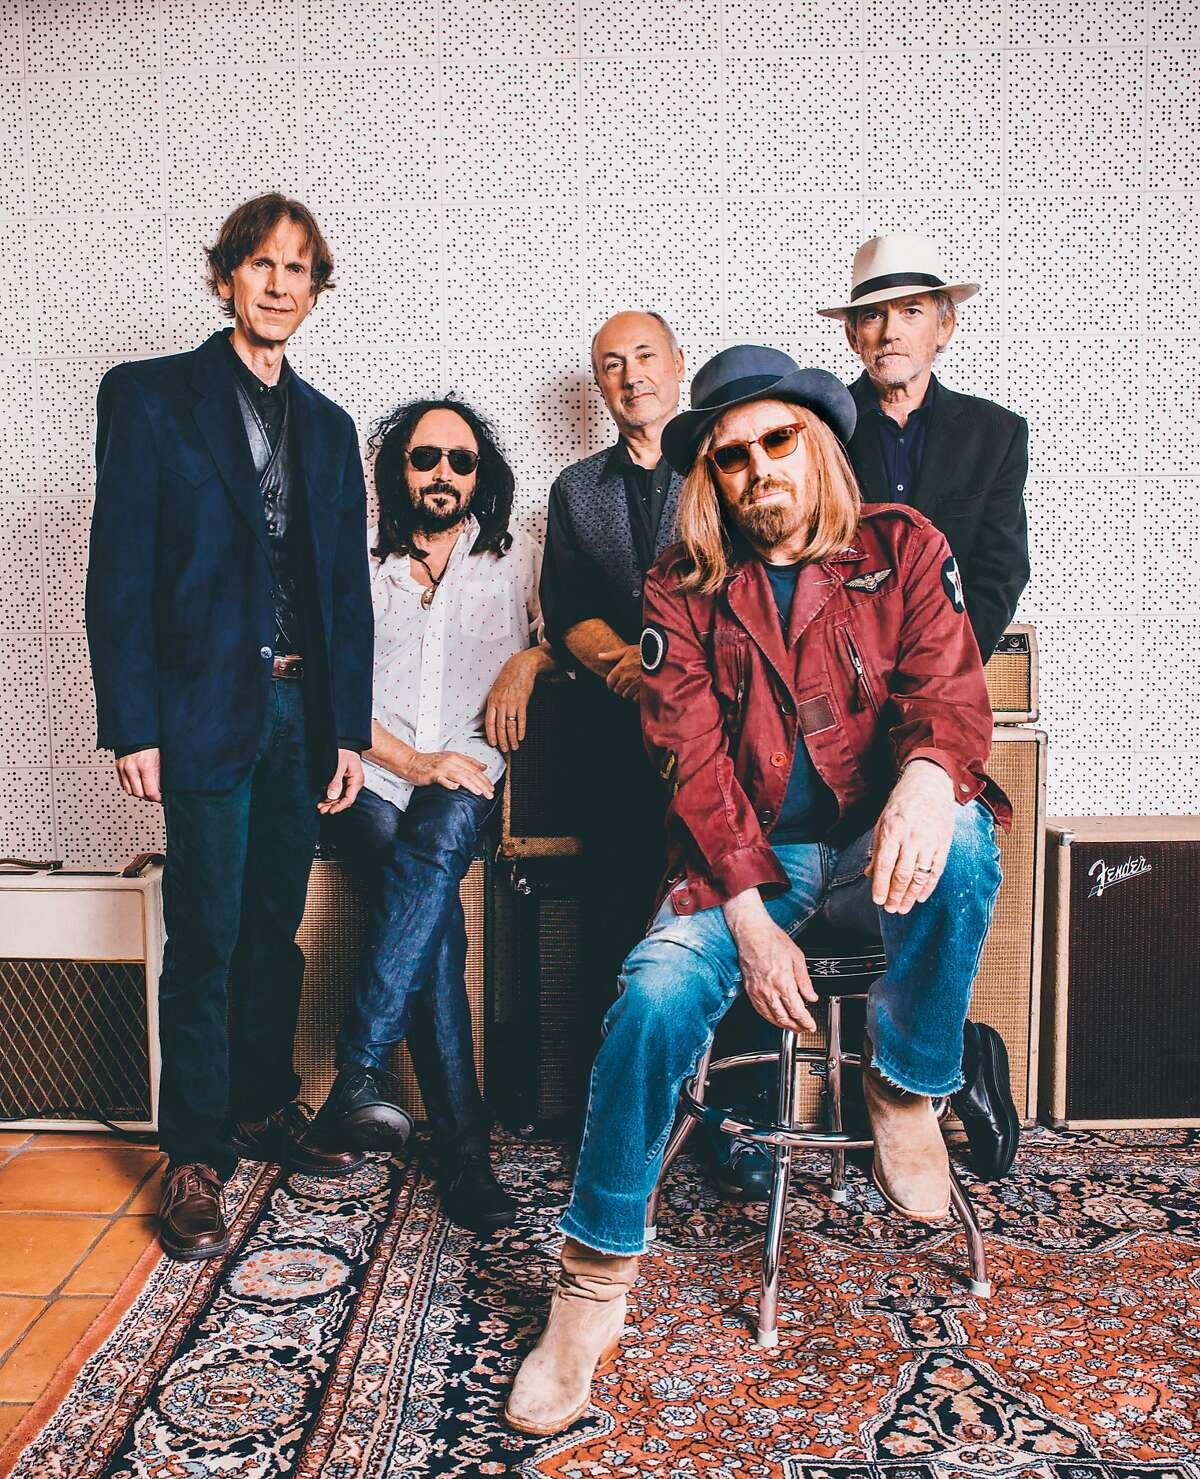 Tom Petty and Mudcrutch